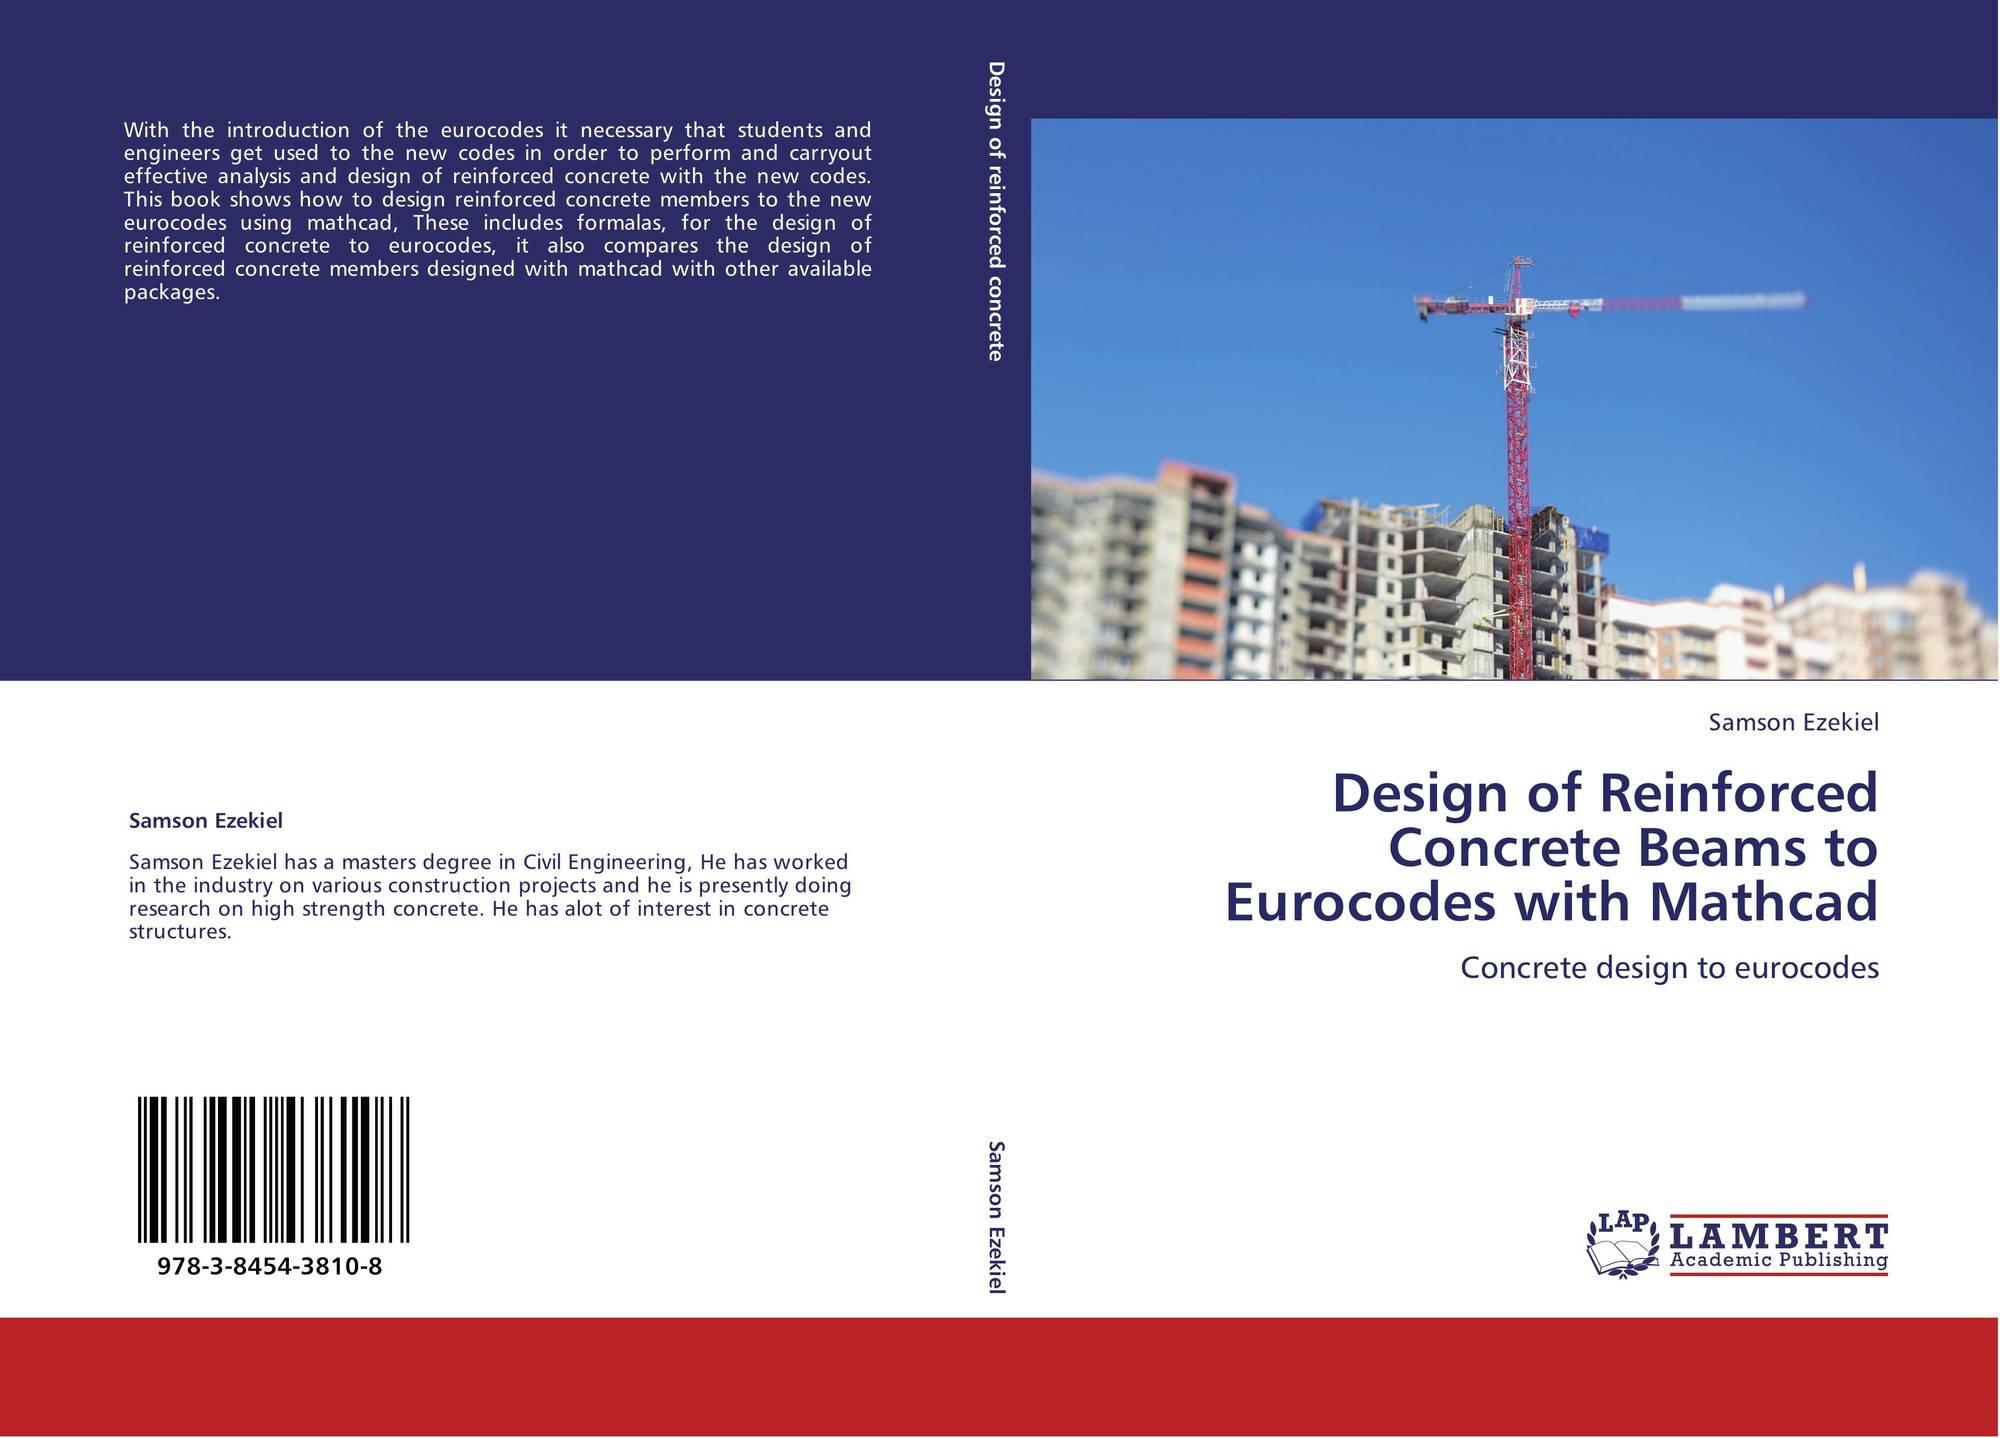 Reinforced Concrete Wall Design Eurocode : Design of reinforced concrete beams to eurocodes with